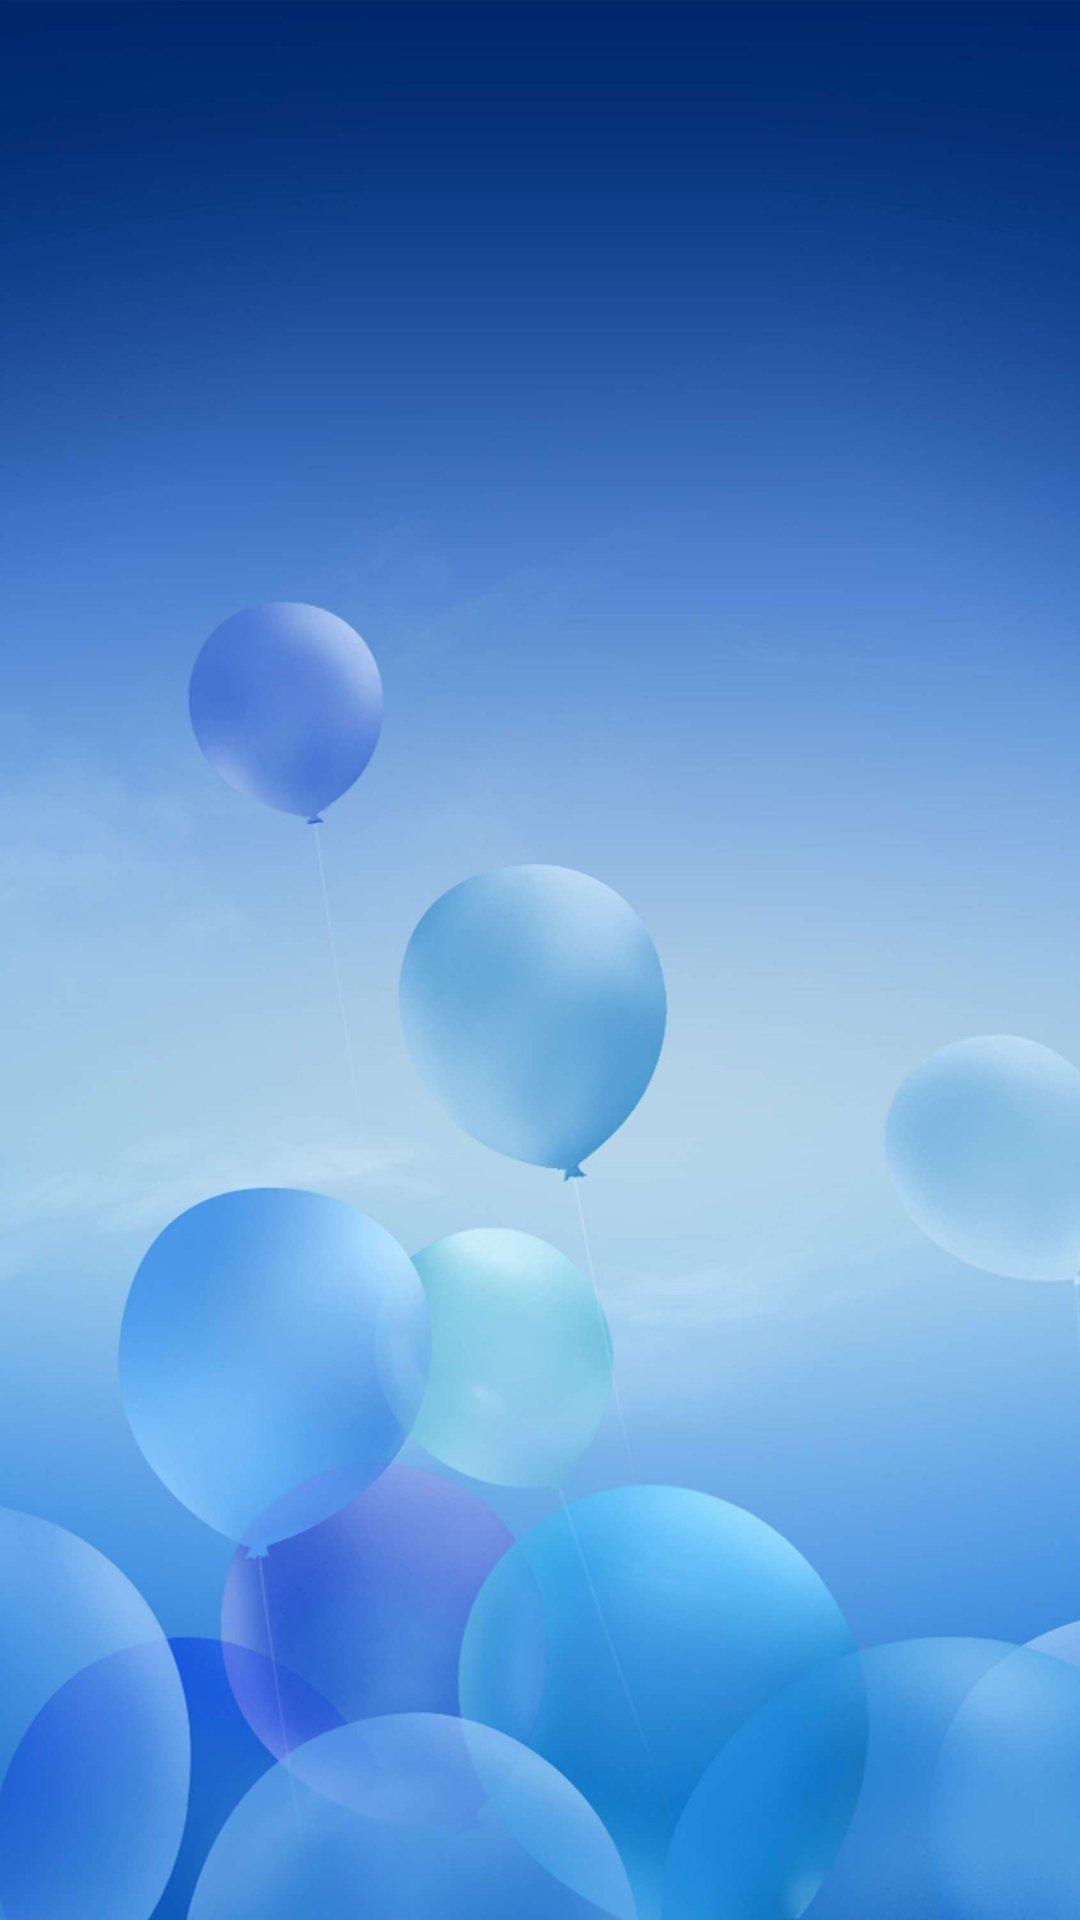 Happy Birthday Balloons Iphone 1080x1920 Wallpaper Teahub Io